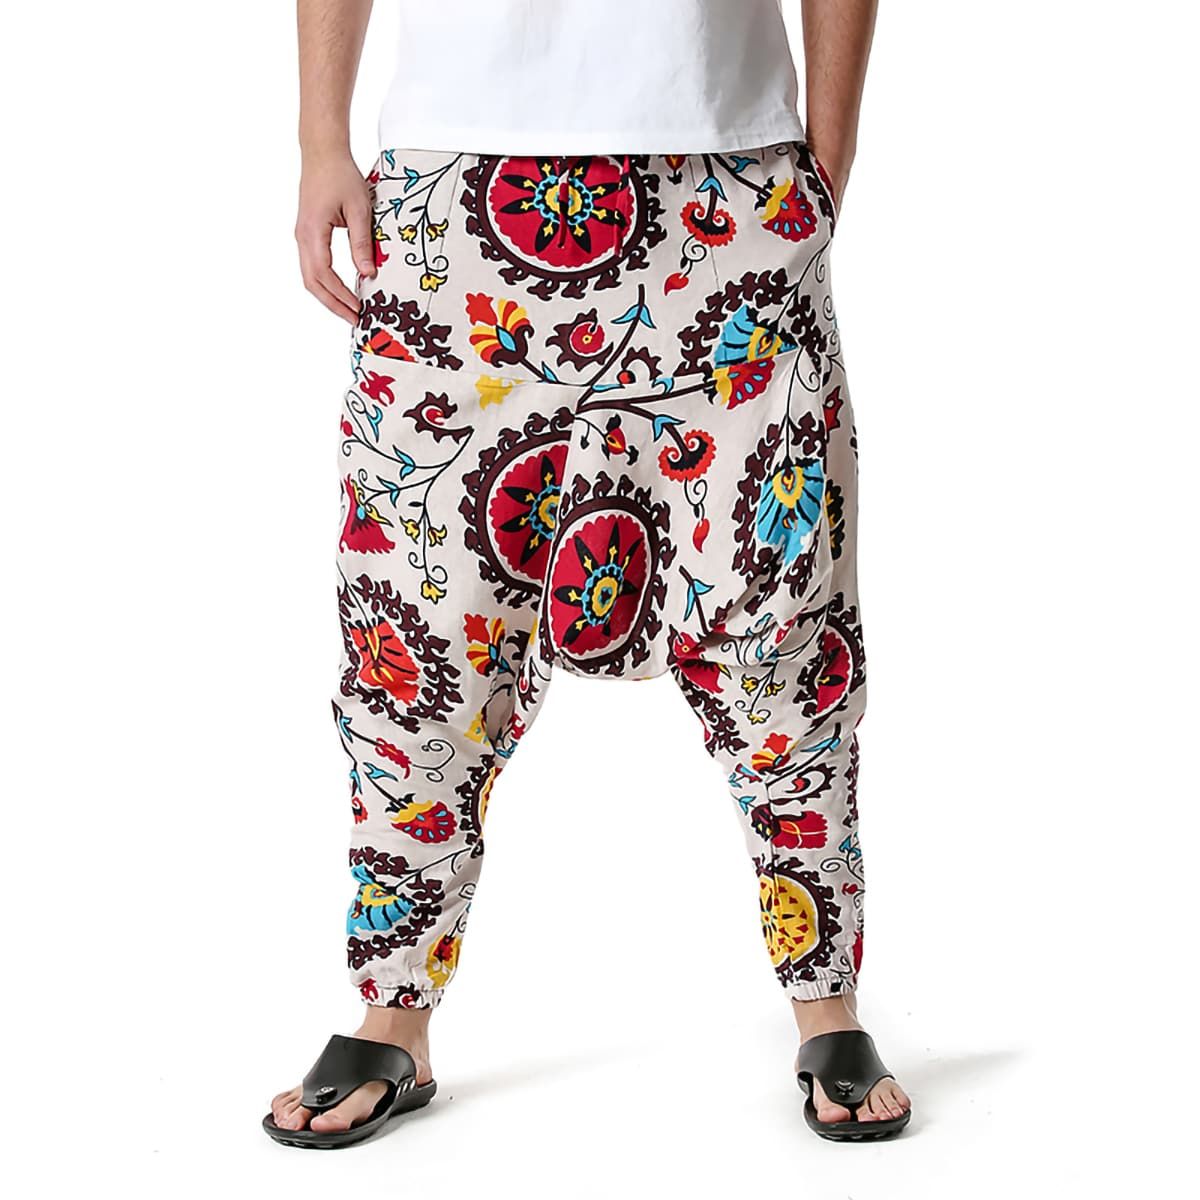 Men Allover Print Pocket Harem Pants, SHEIN  - buy with discount